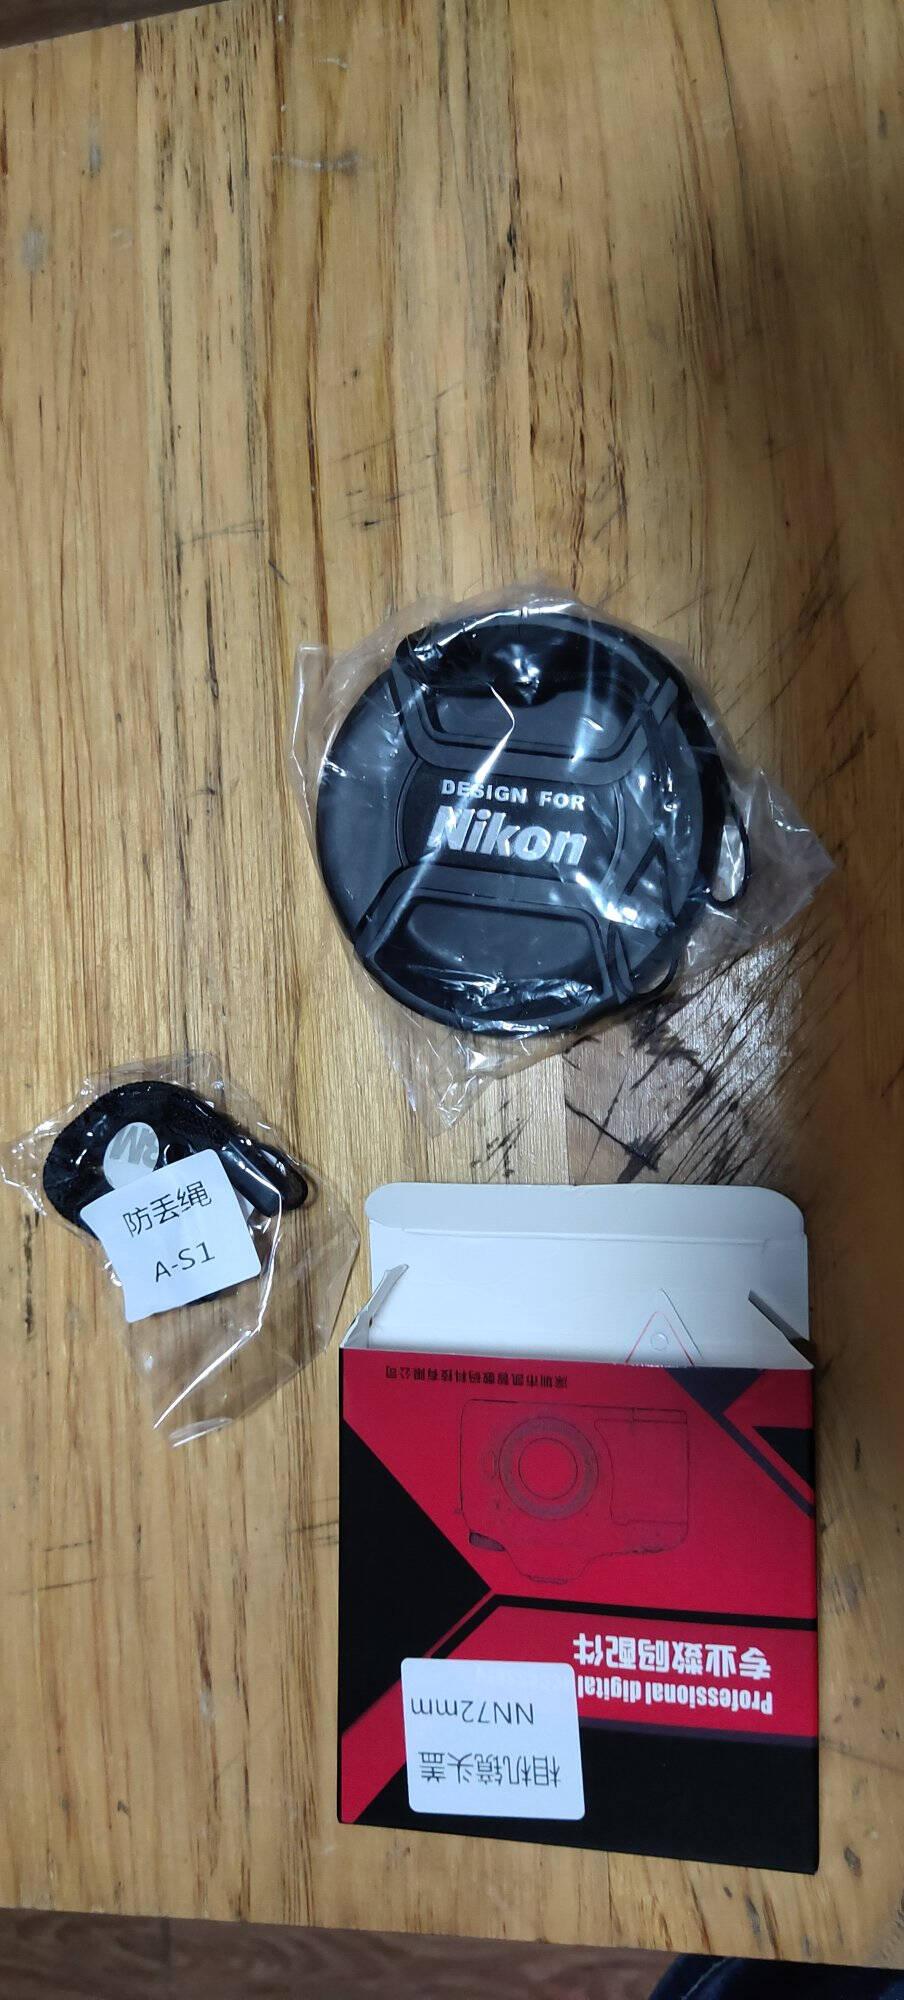 qeento尼康D500D7500D7200D7100D7000单反相机18-200镜头盖67mm相机盖保护盖镜头前盖